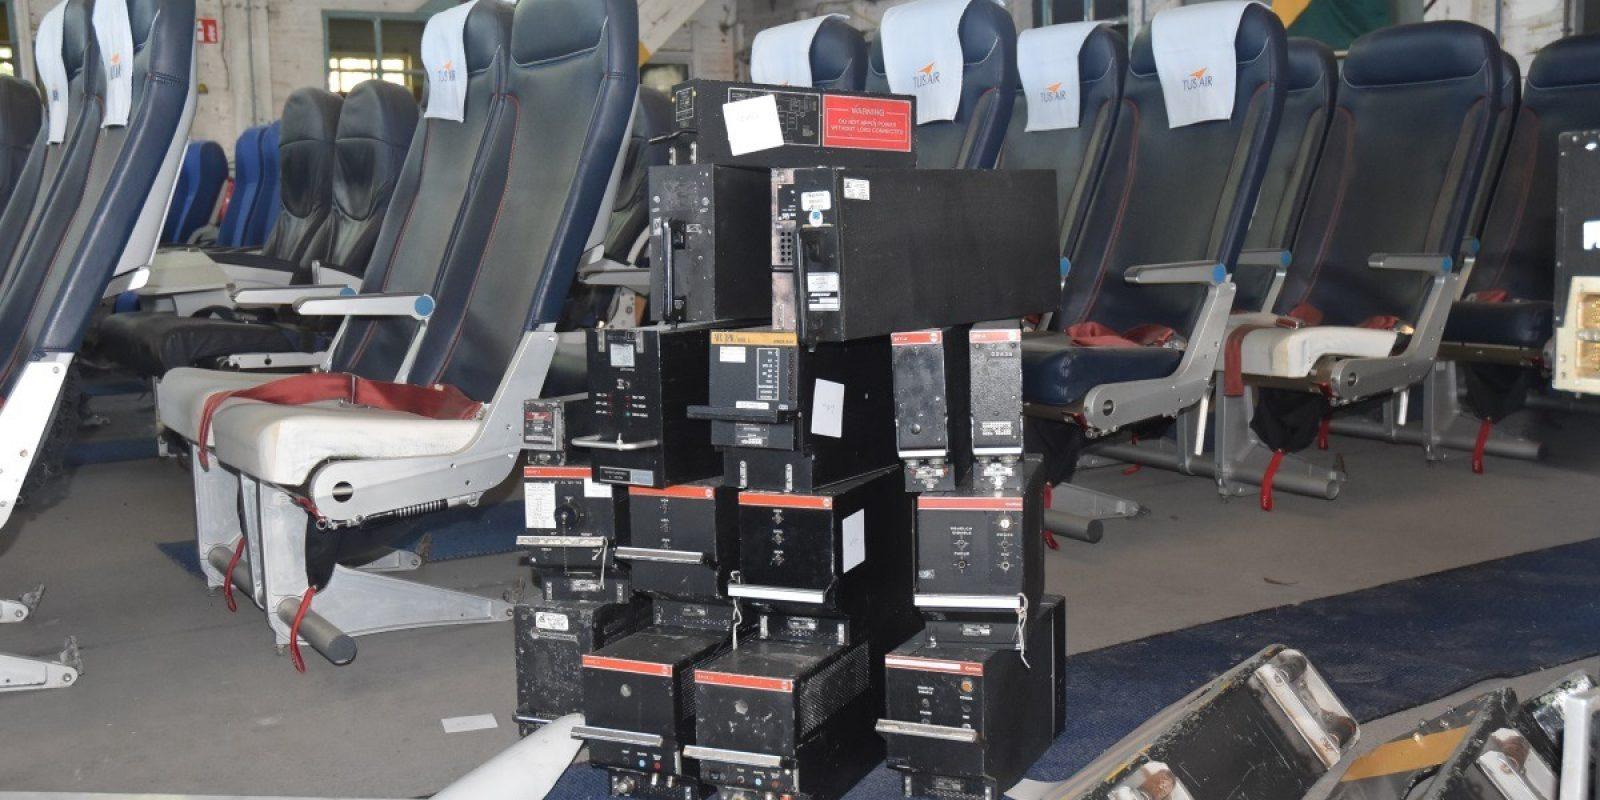 Zowel elektronica is hier te koop als F70-vliegtuigzetels van Tus Airways. (Foto Luc Wittemans)